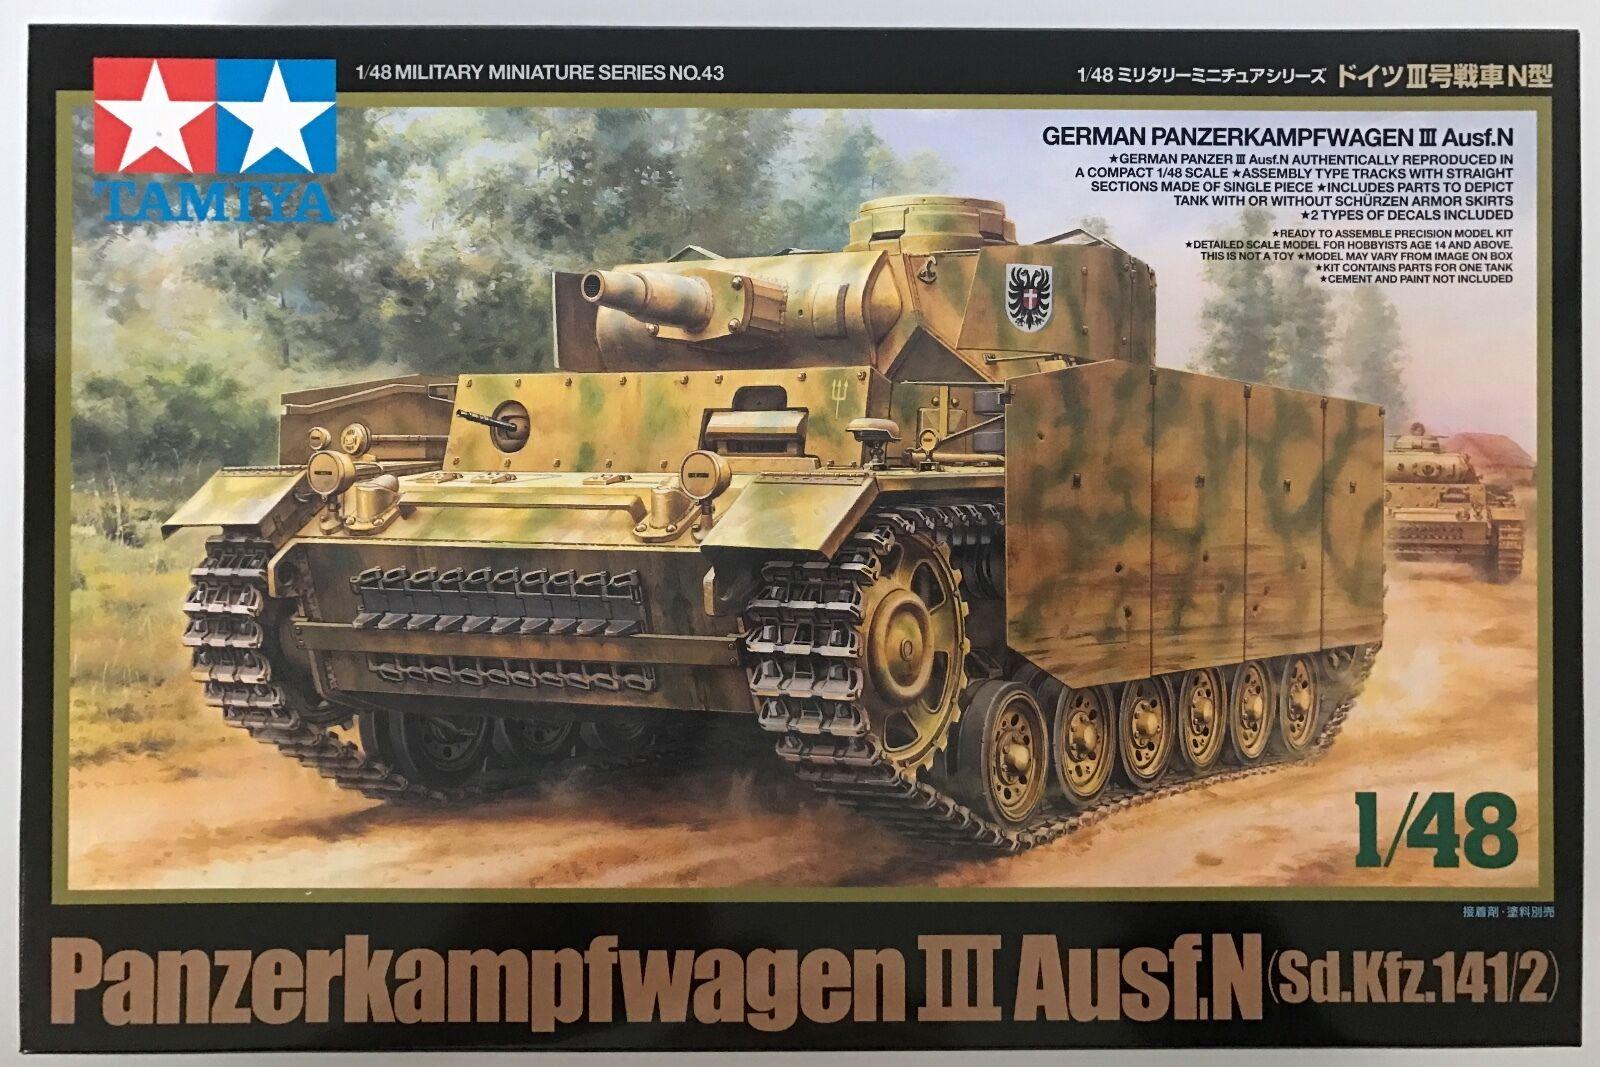 TAMIYA 32543 Panzerkampwagen III AuSF.N (Sd.Kfz.141  2) 1  43 Förlaga Kit NIB